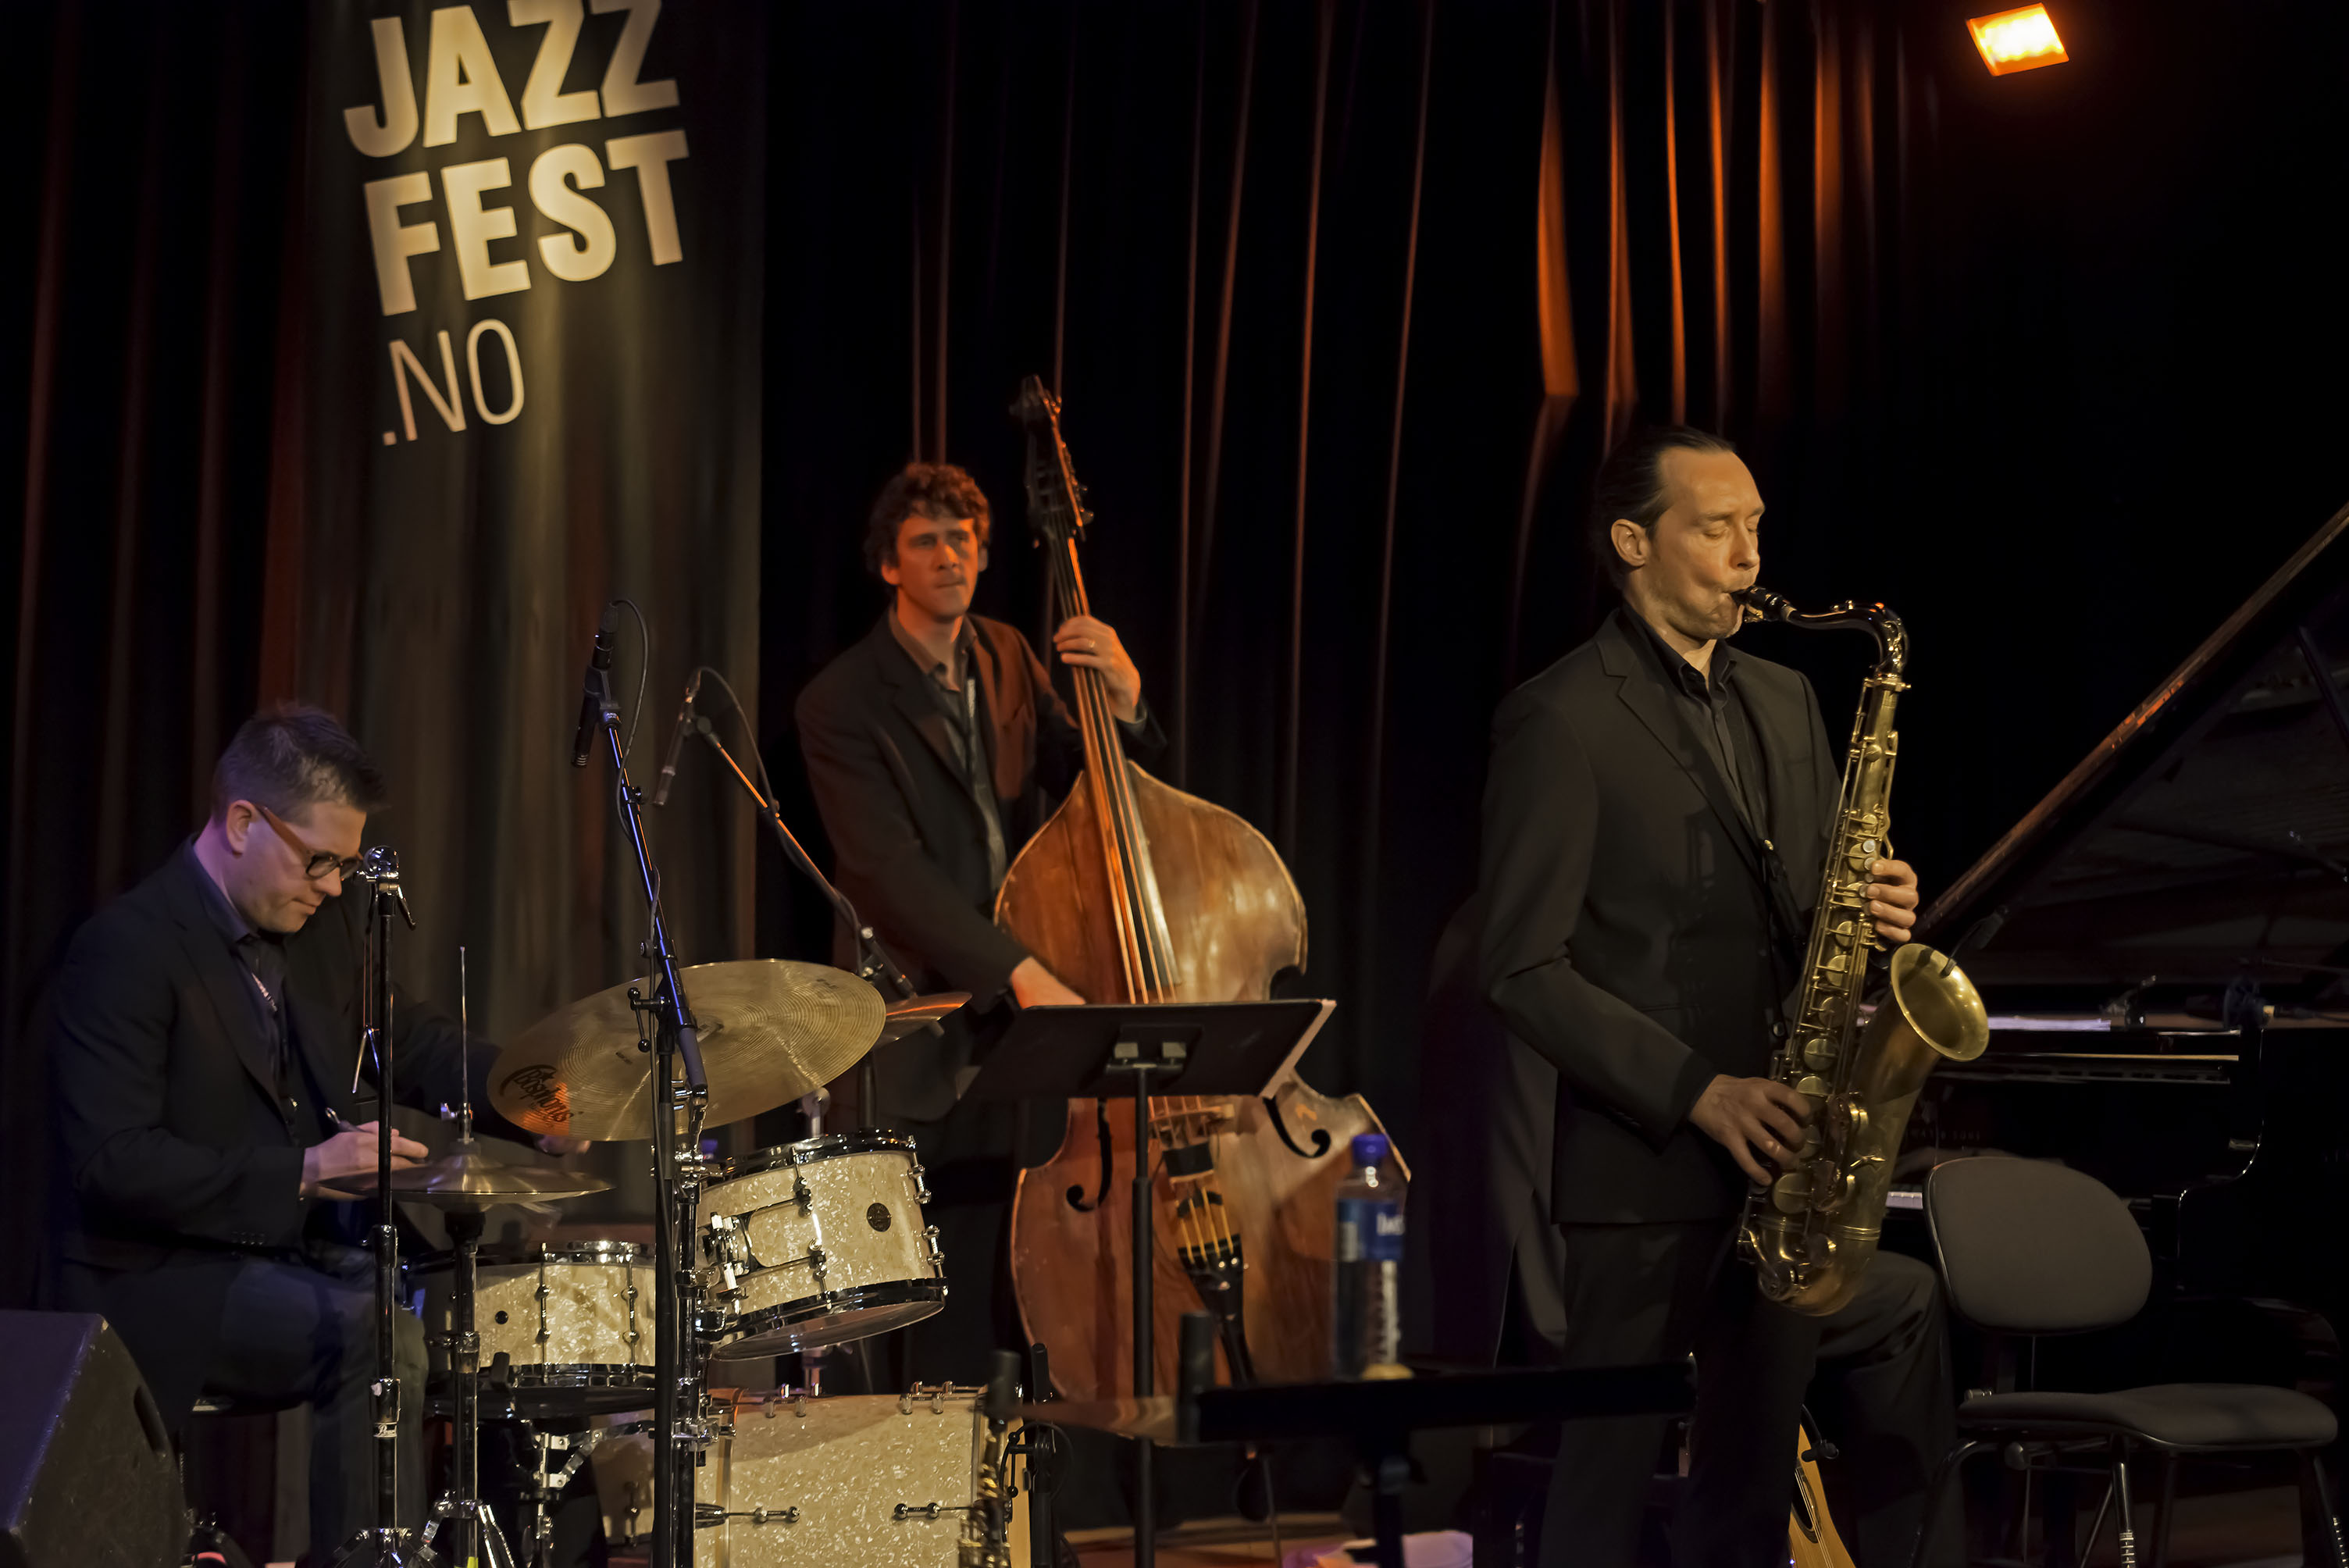 Stacey Kent Band, Trondheim Jazz Festival 2012